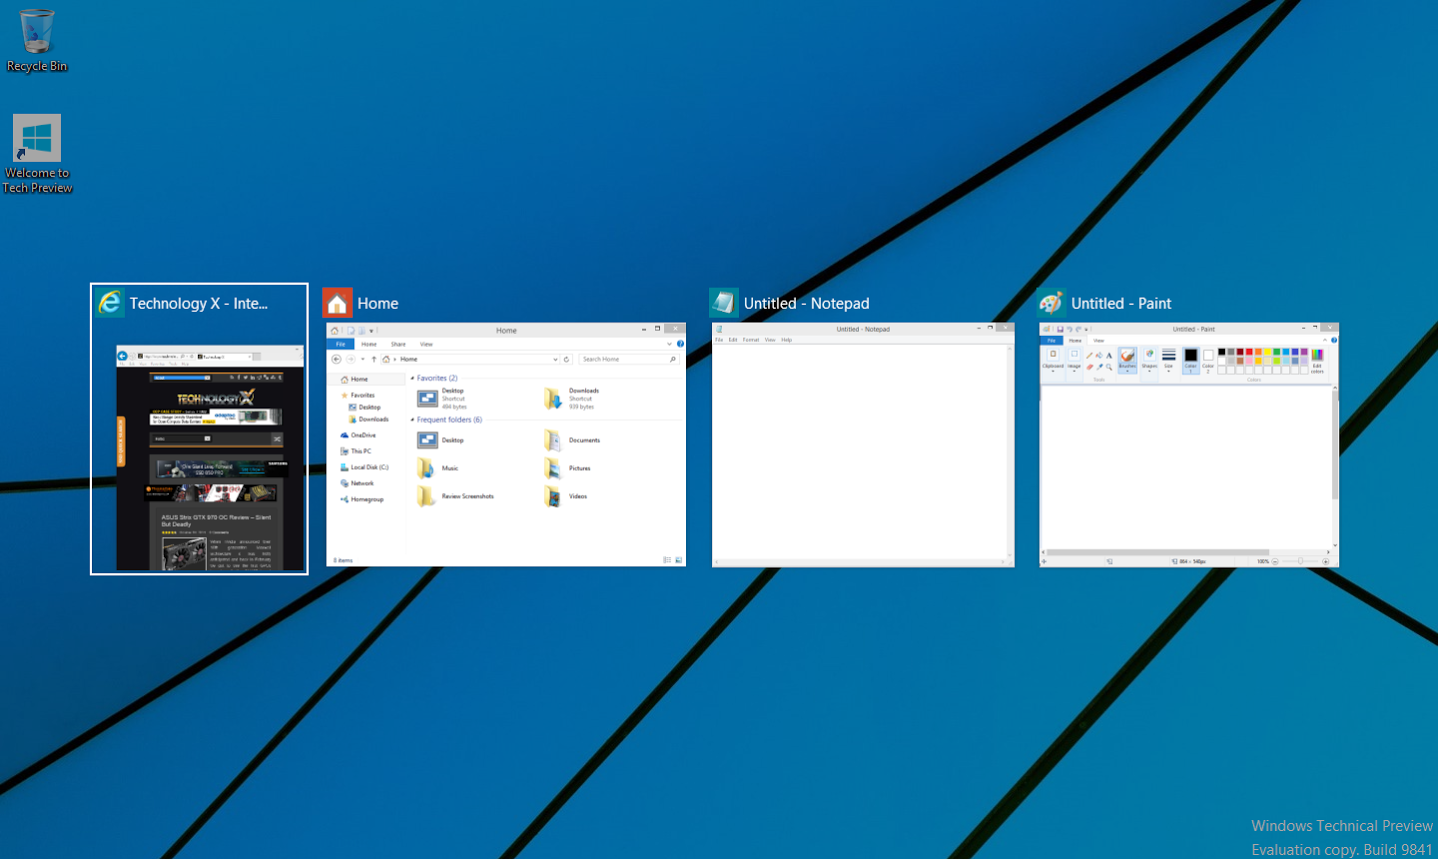 how to bring up taskbar on windows 8